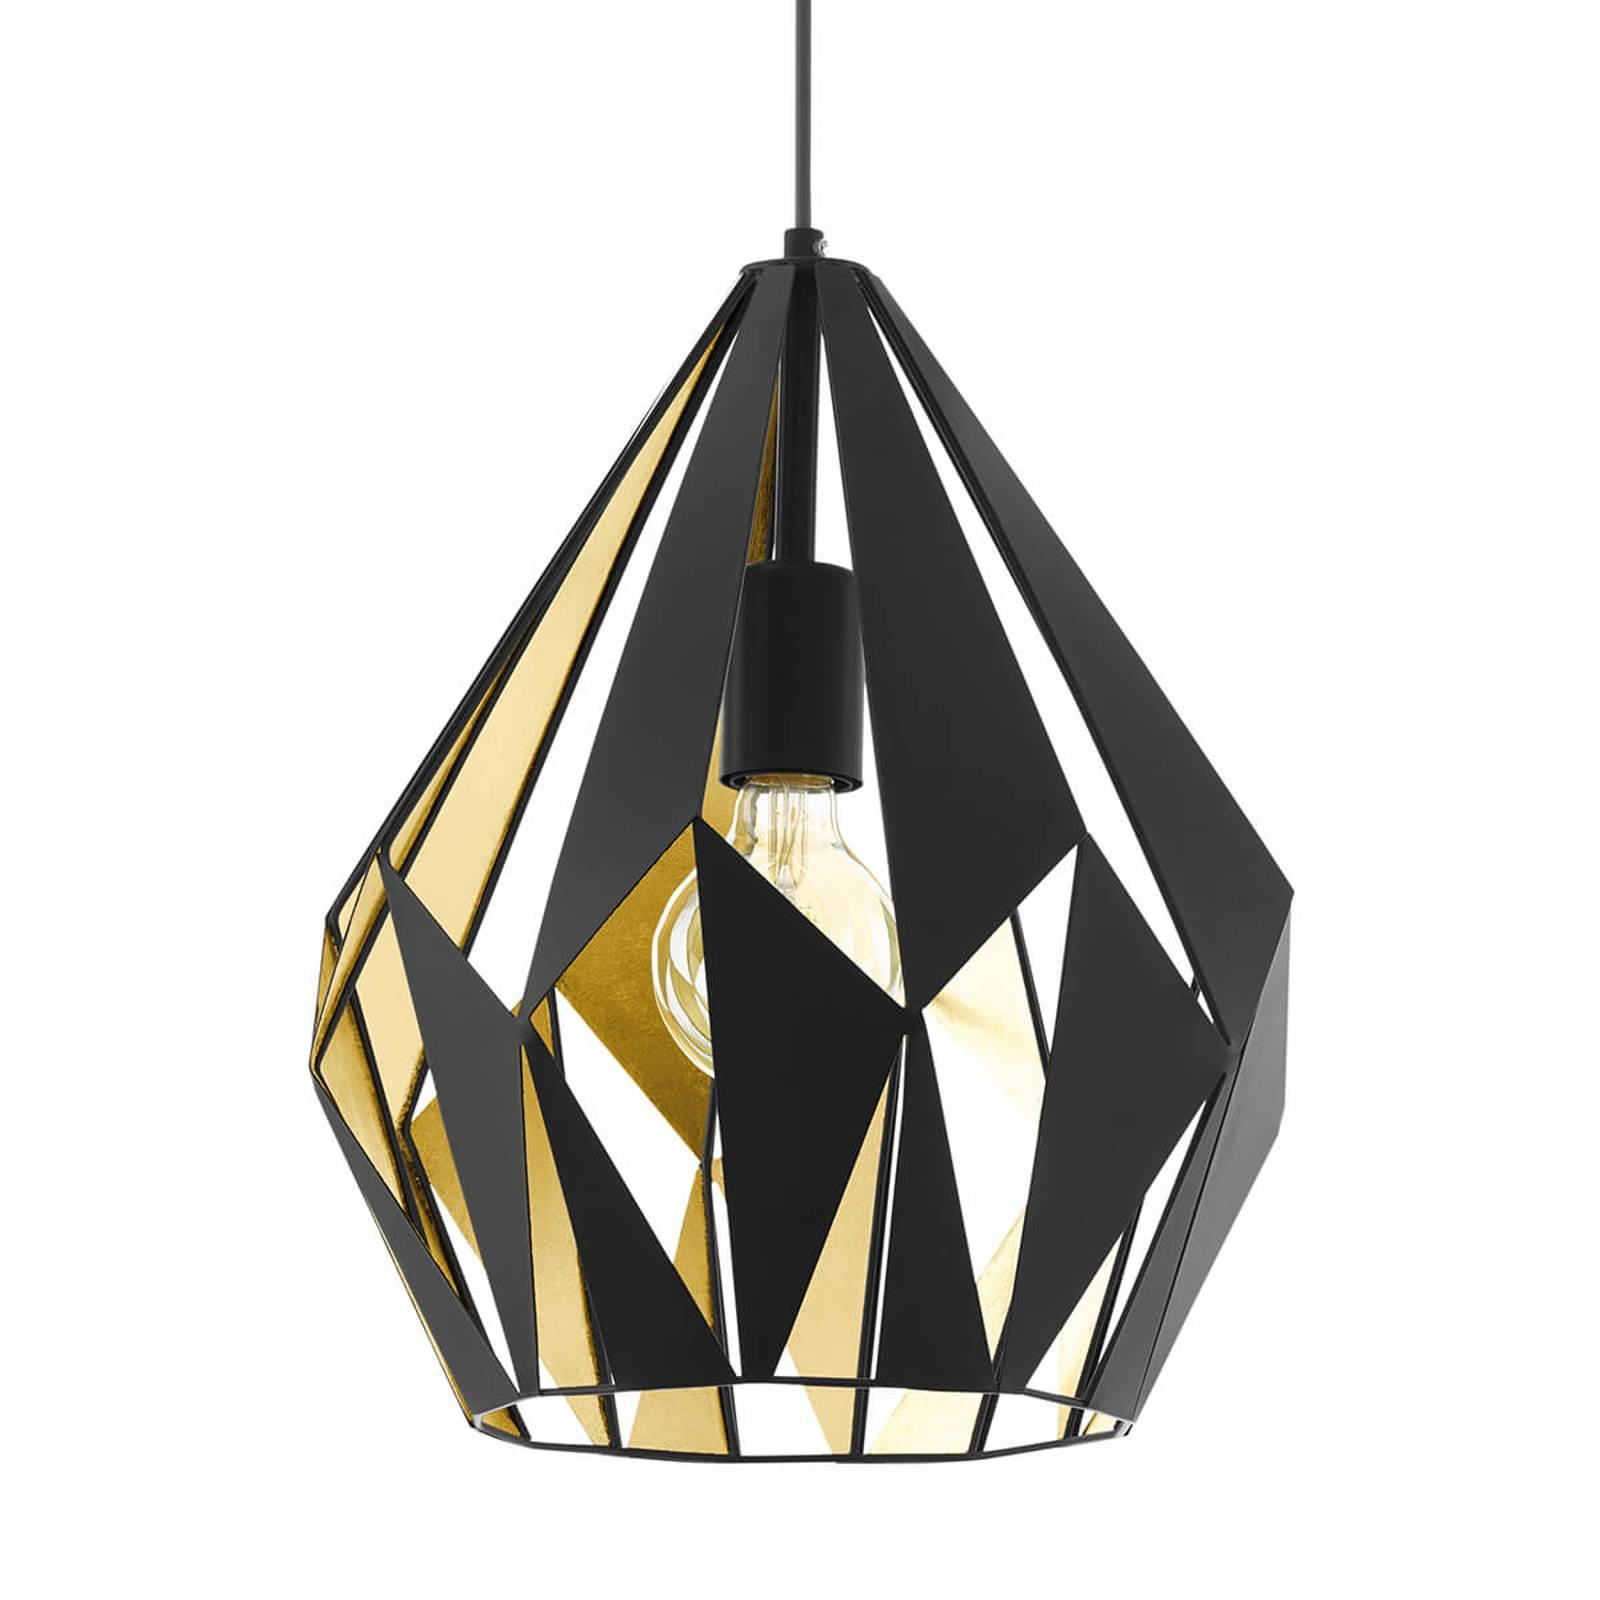 Hanglamp Carlton in het zwart